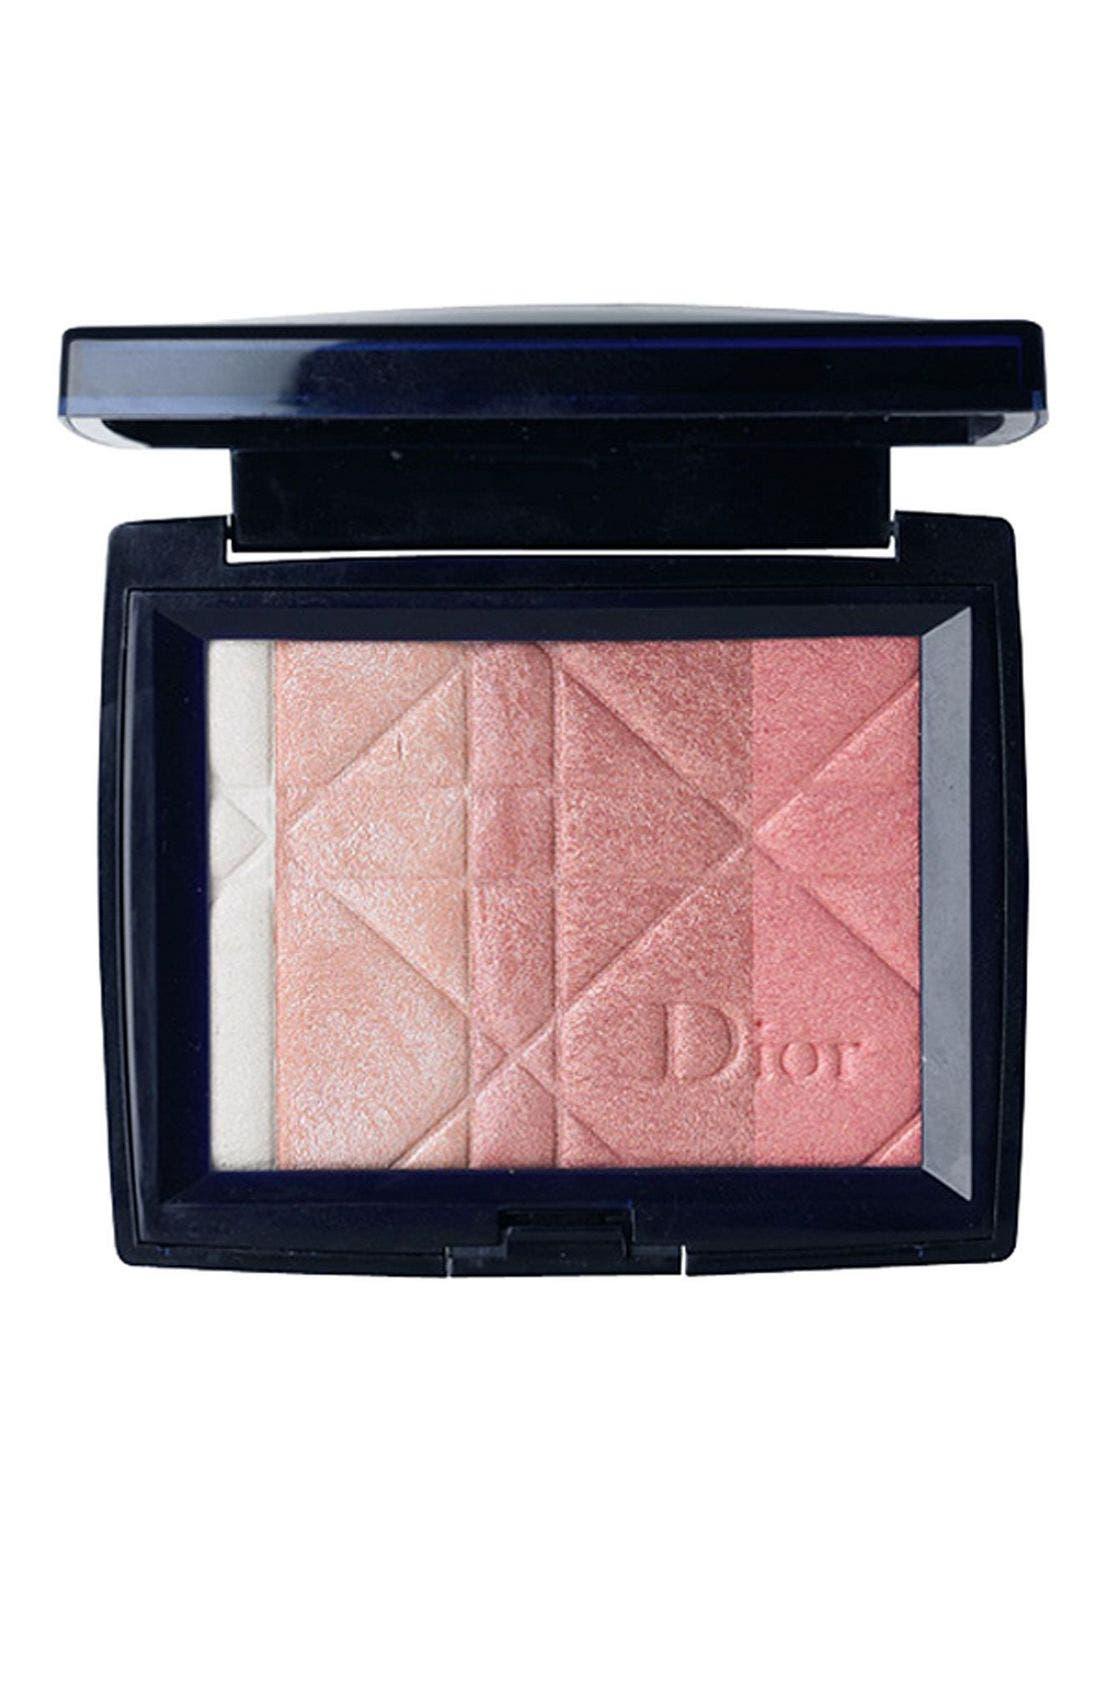 DIOR, 'Diorskin' Ultra Shimmering Allover Face Powder, Main thumbnail 1, color, 000